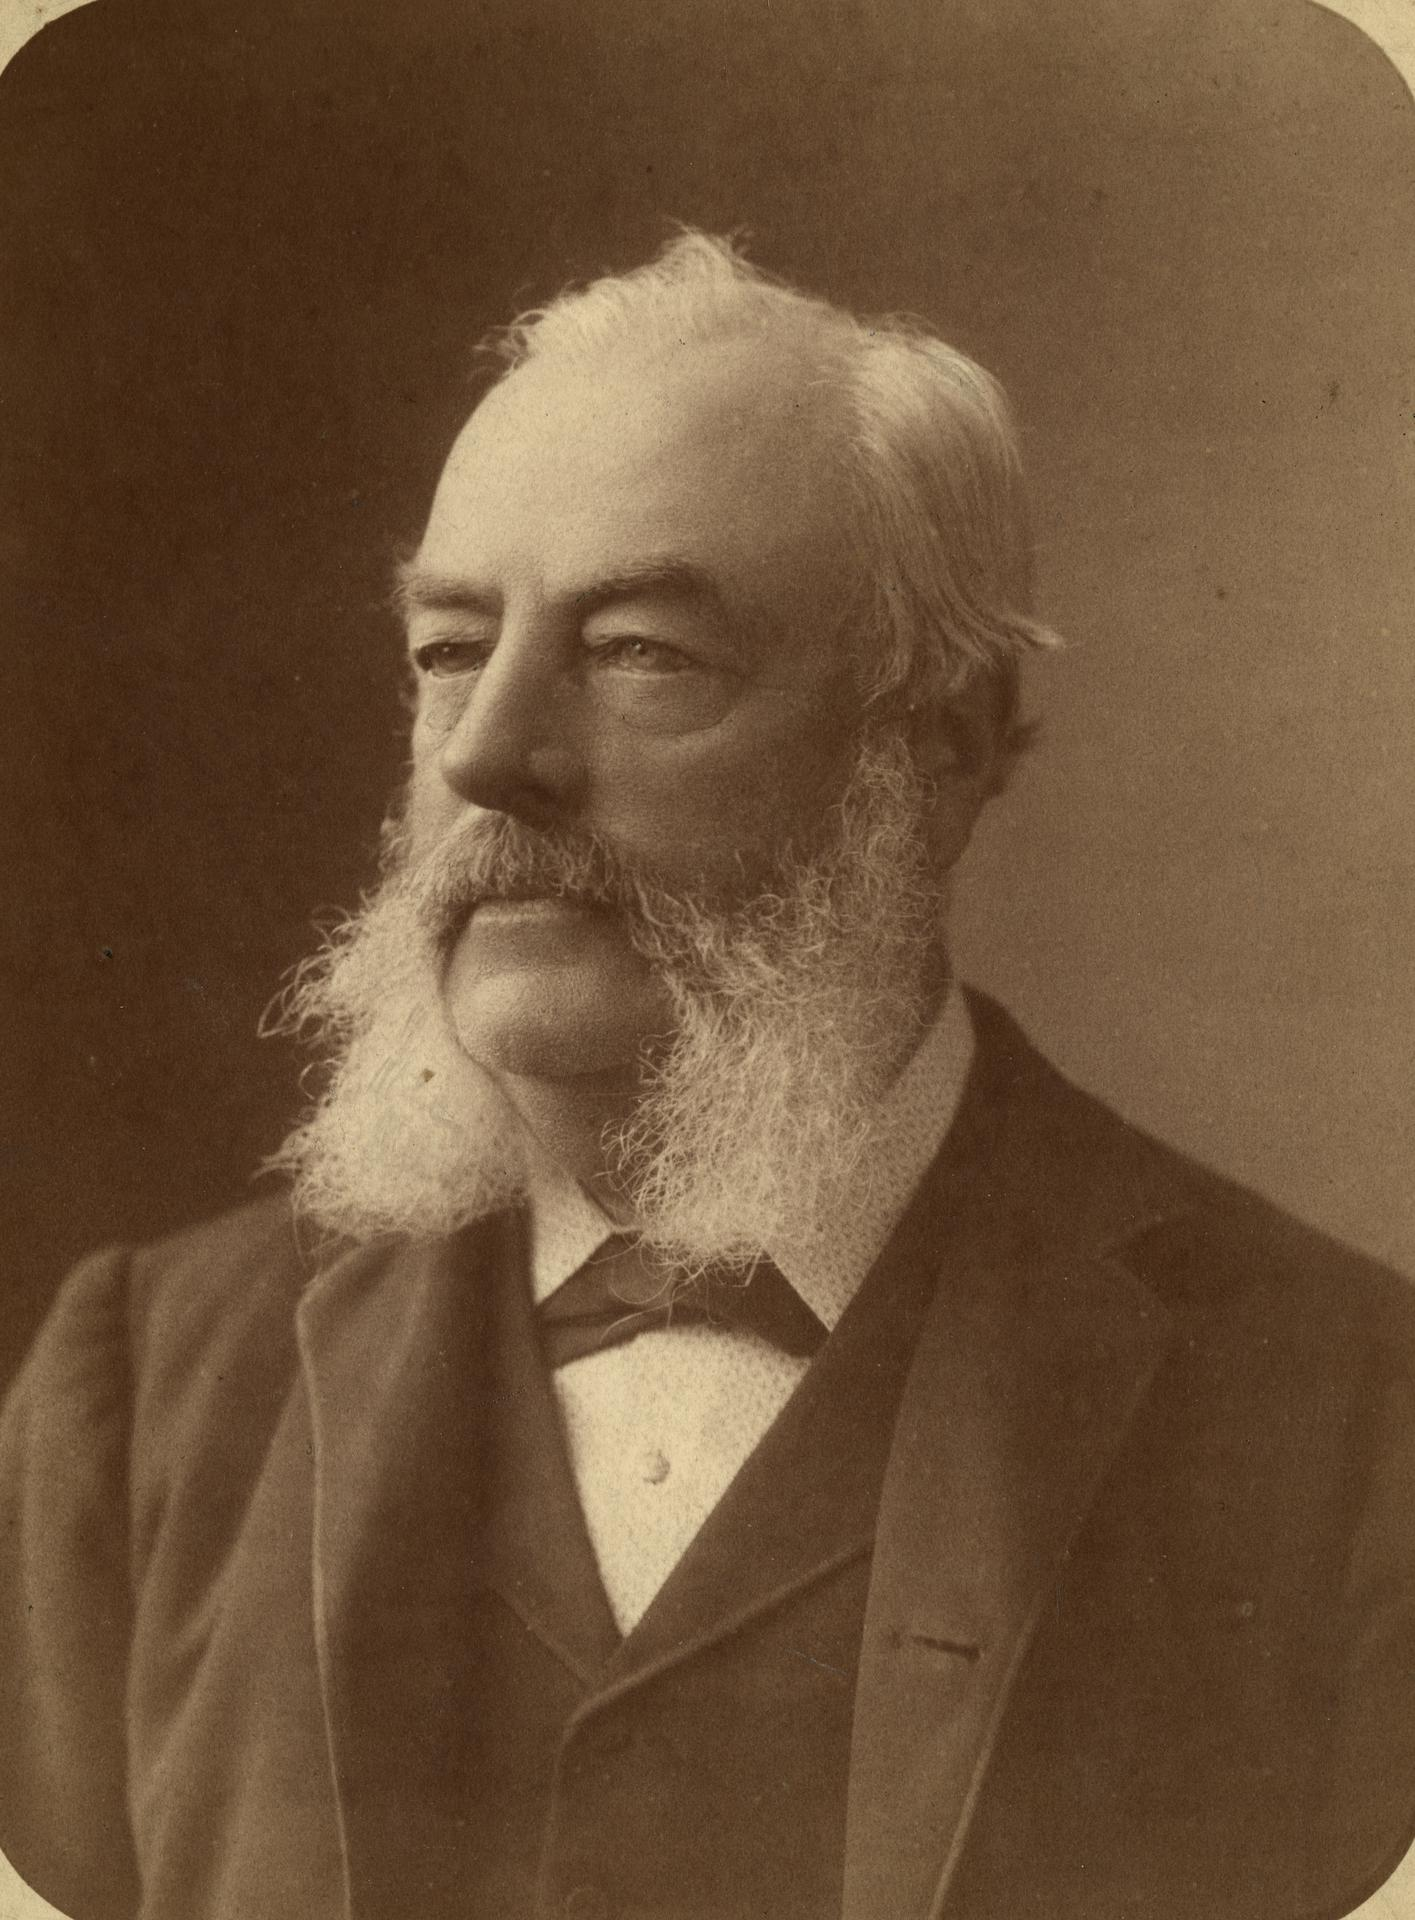 Professor George B. Halford